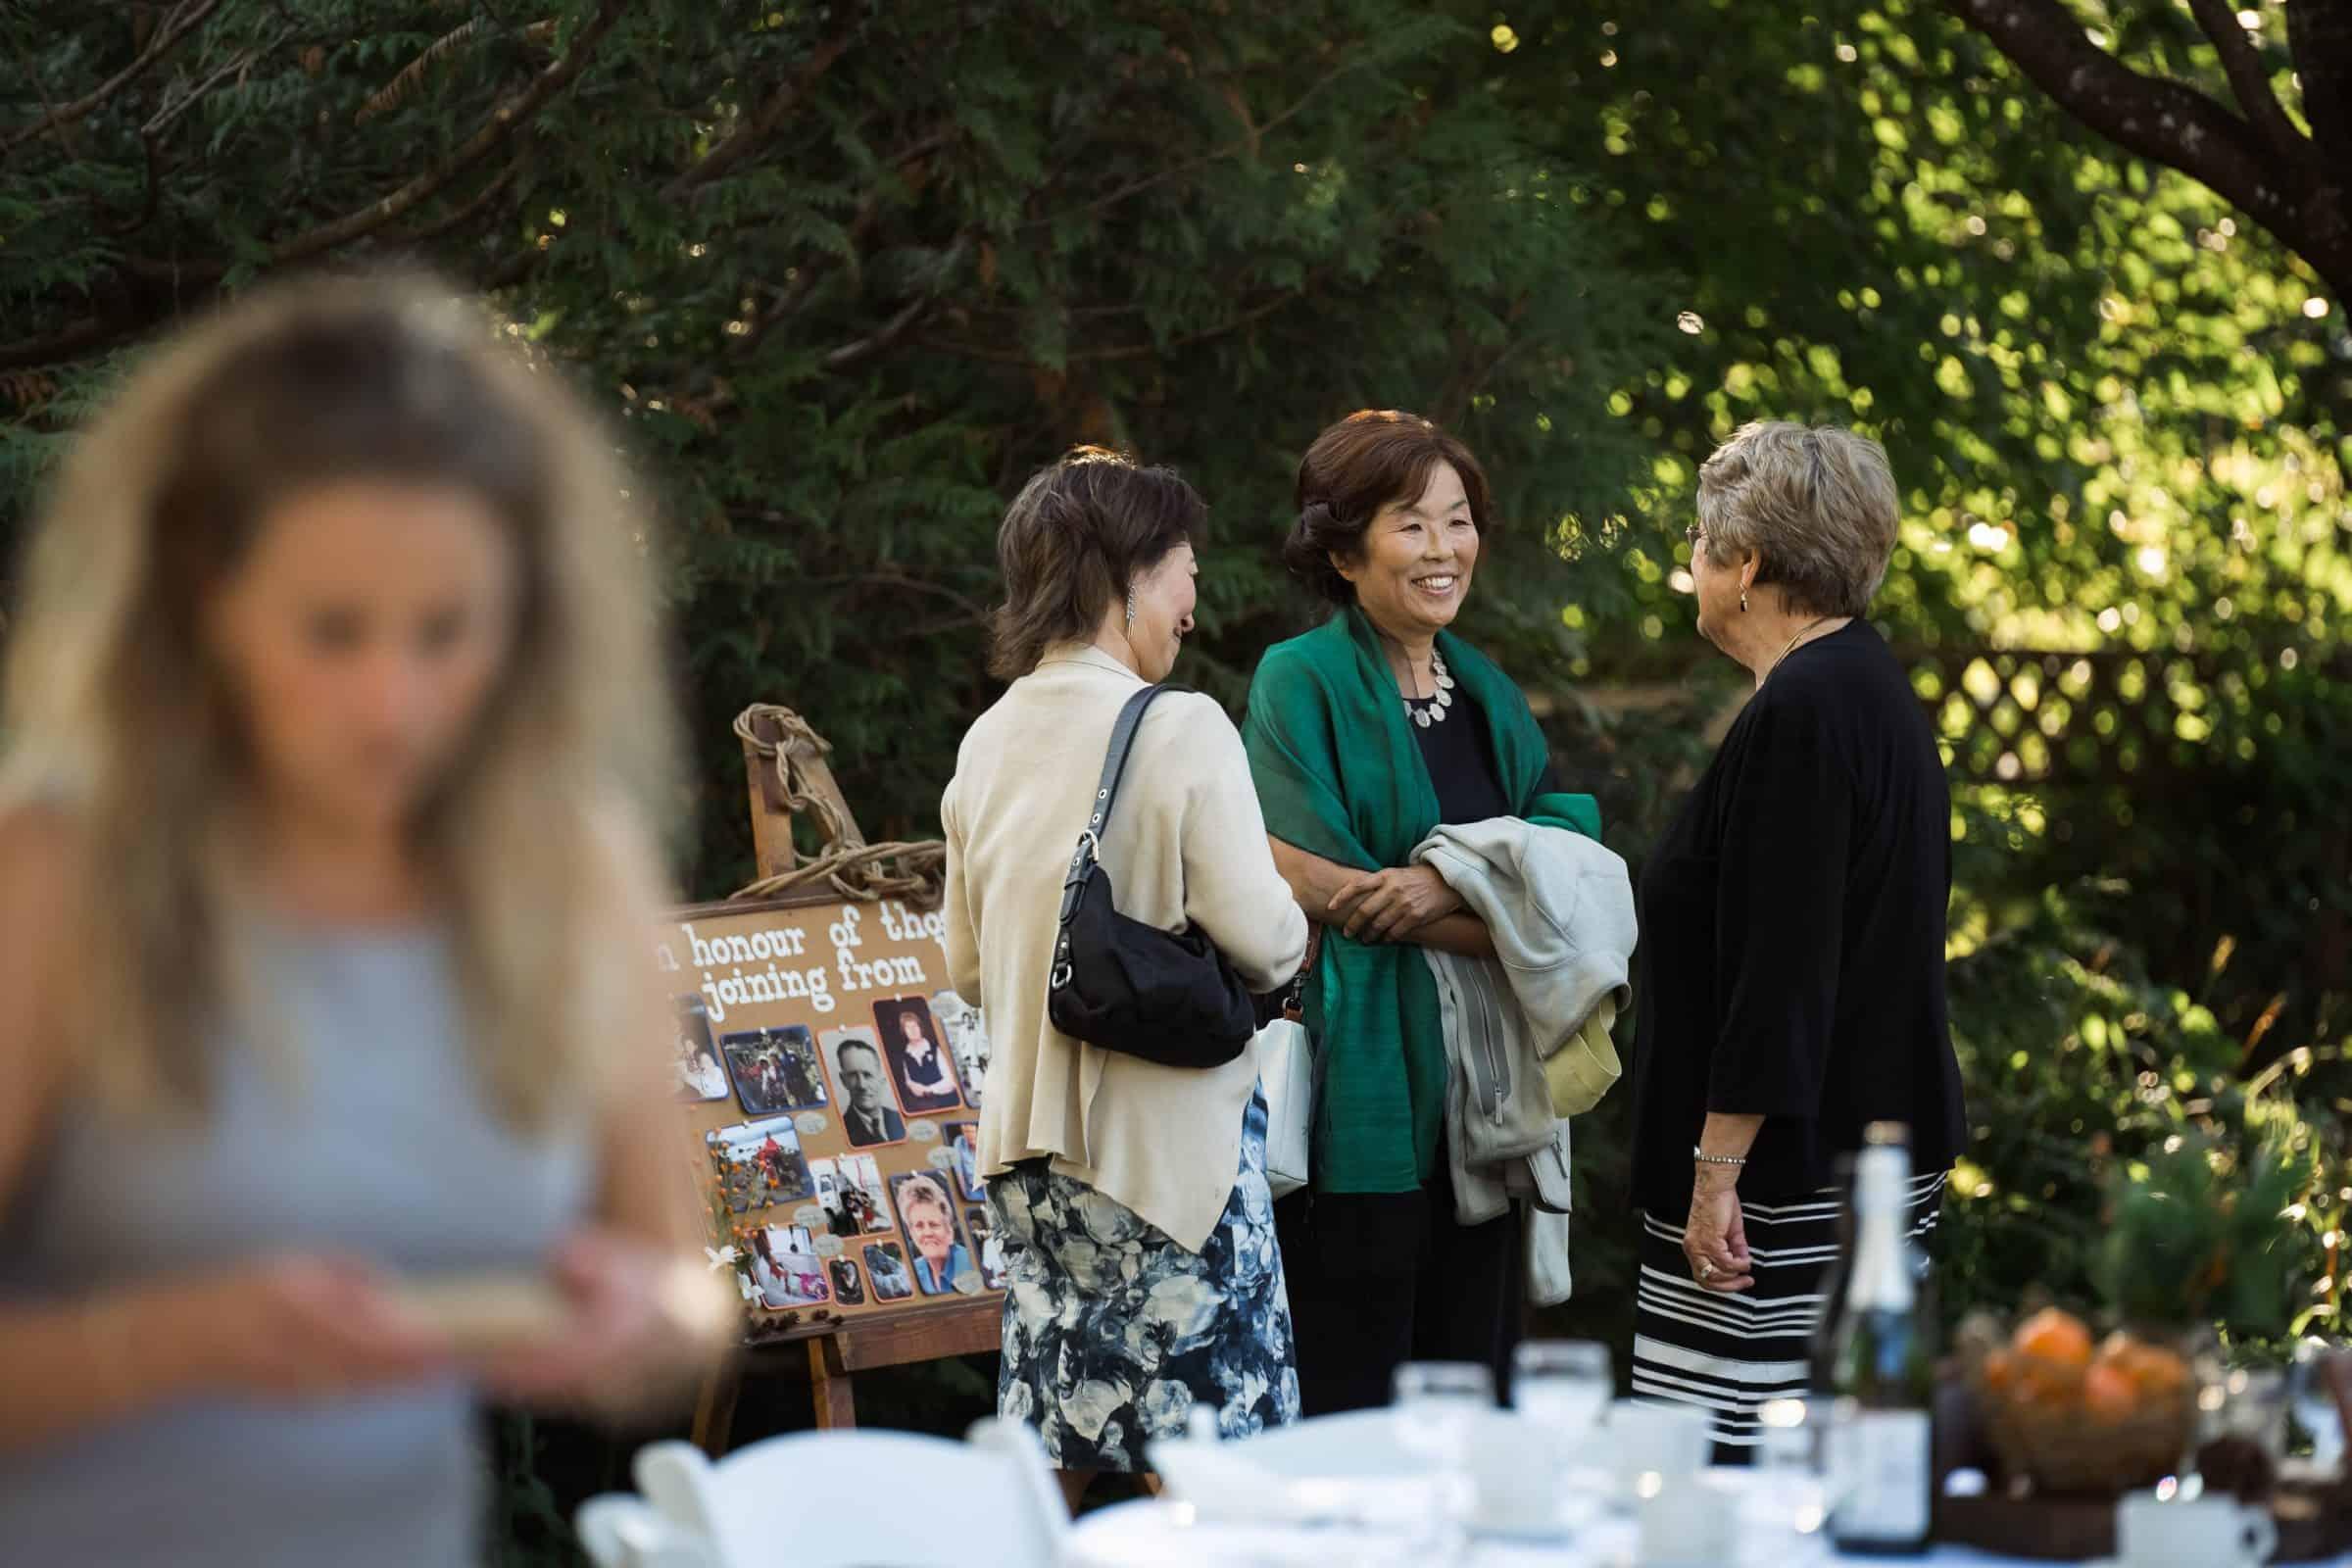 ladies smiling and talking in backyard at wedding